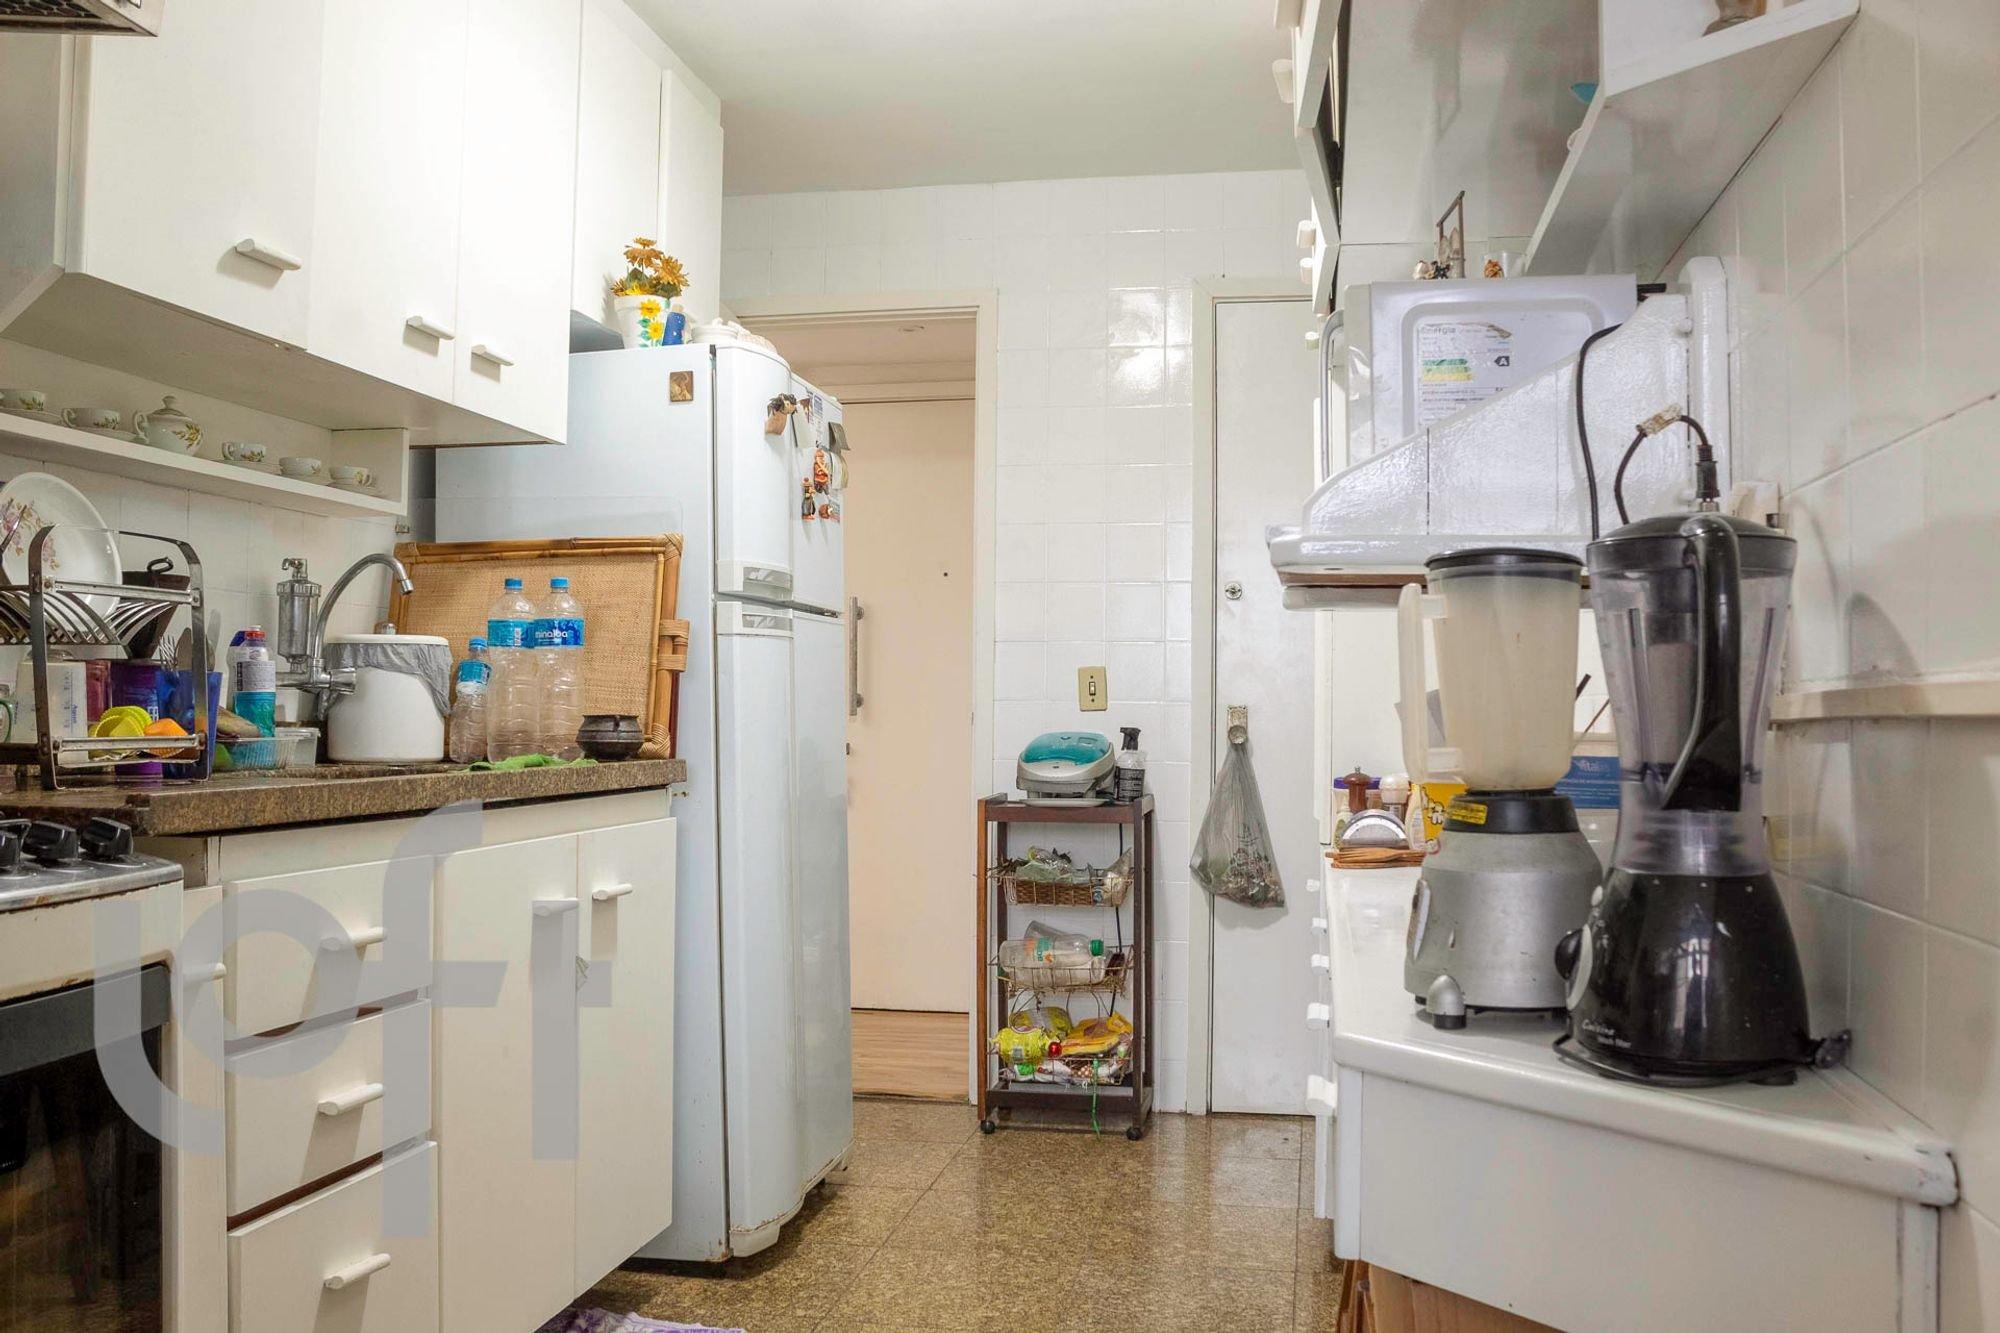 Foto de Varanda com tigela, geladeira, garrafa